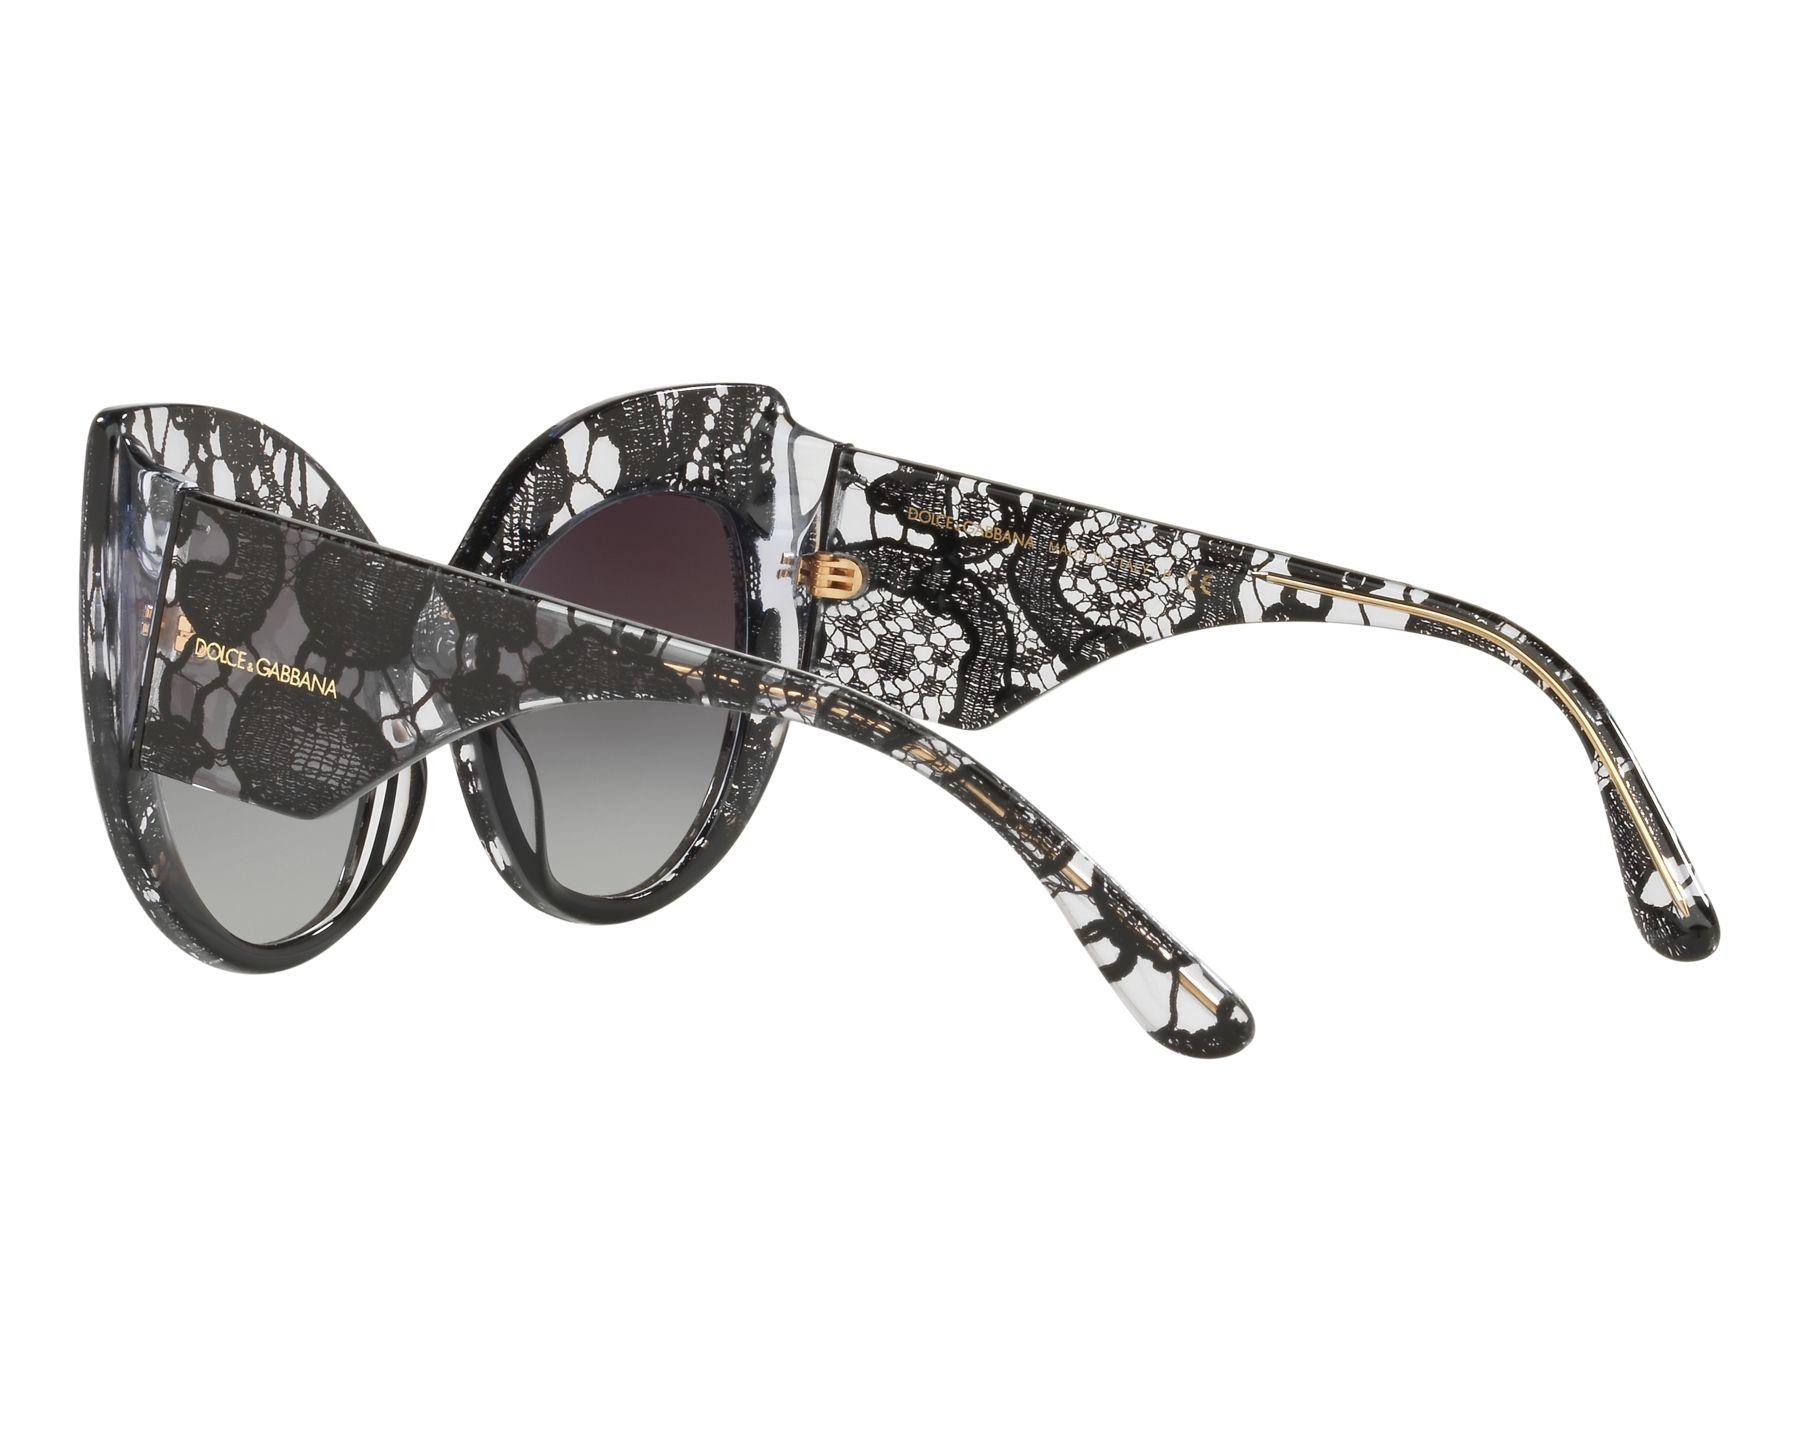 Dolce Gabbana 4321/31528g jnUDgm1I